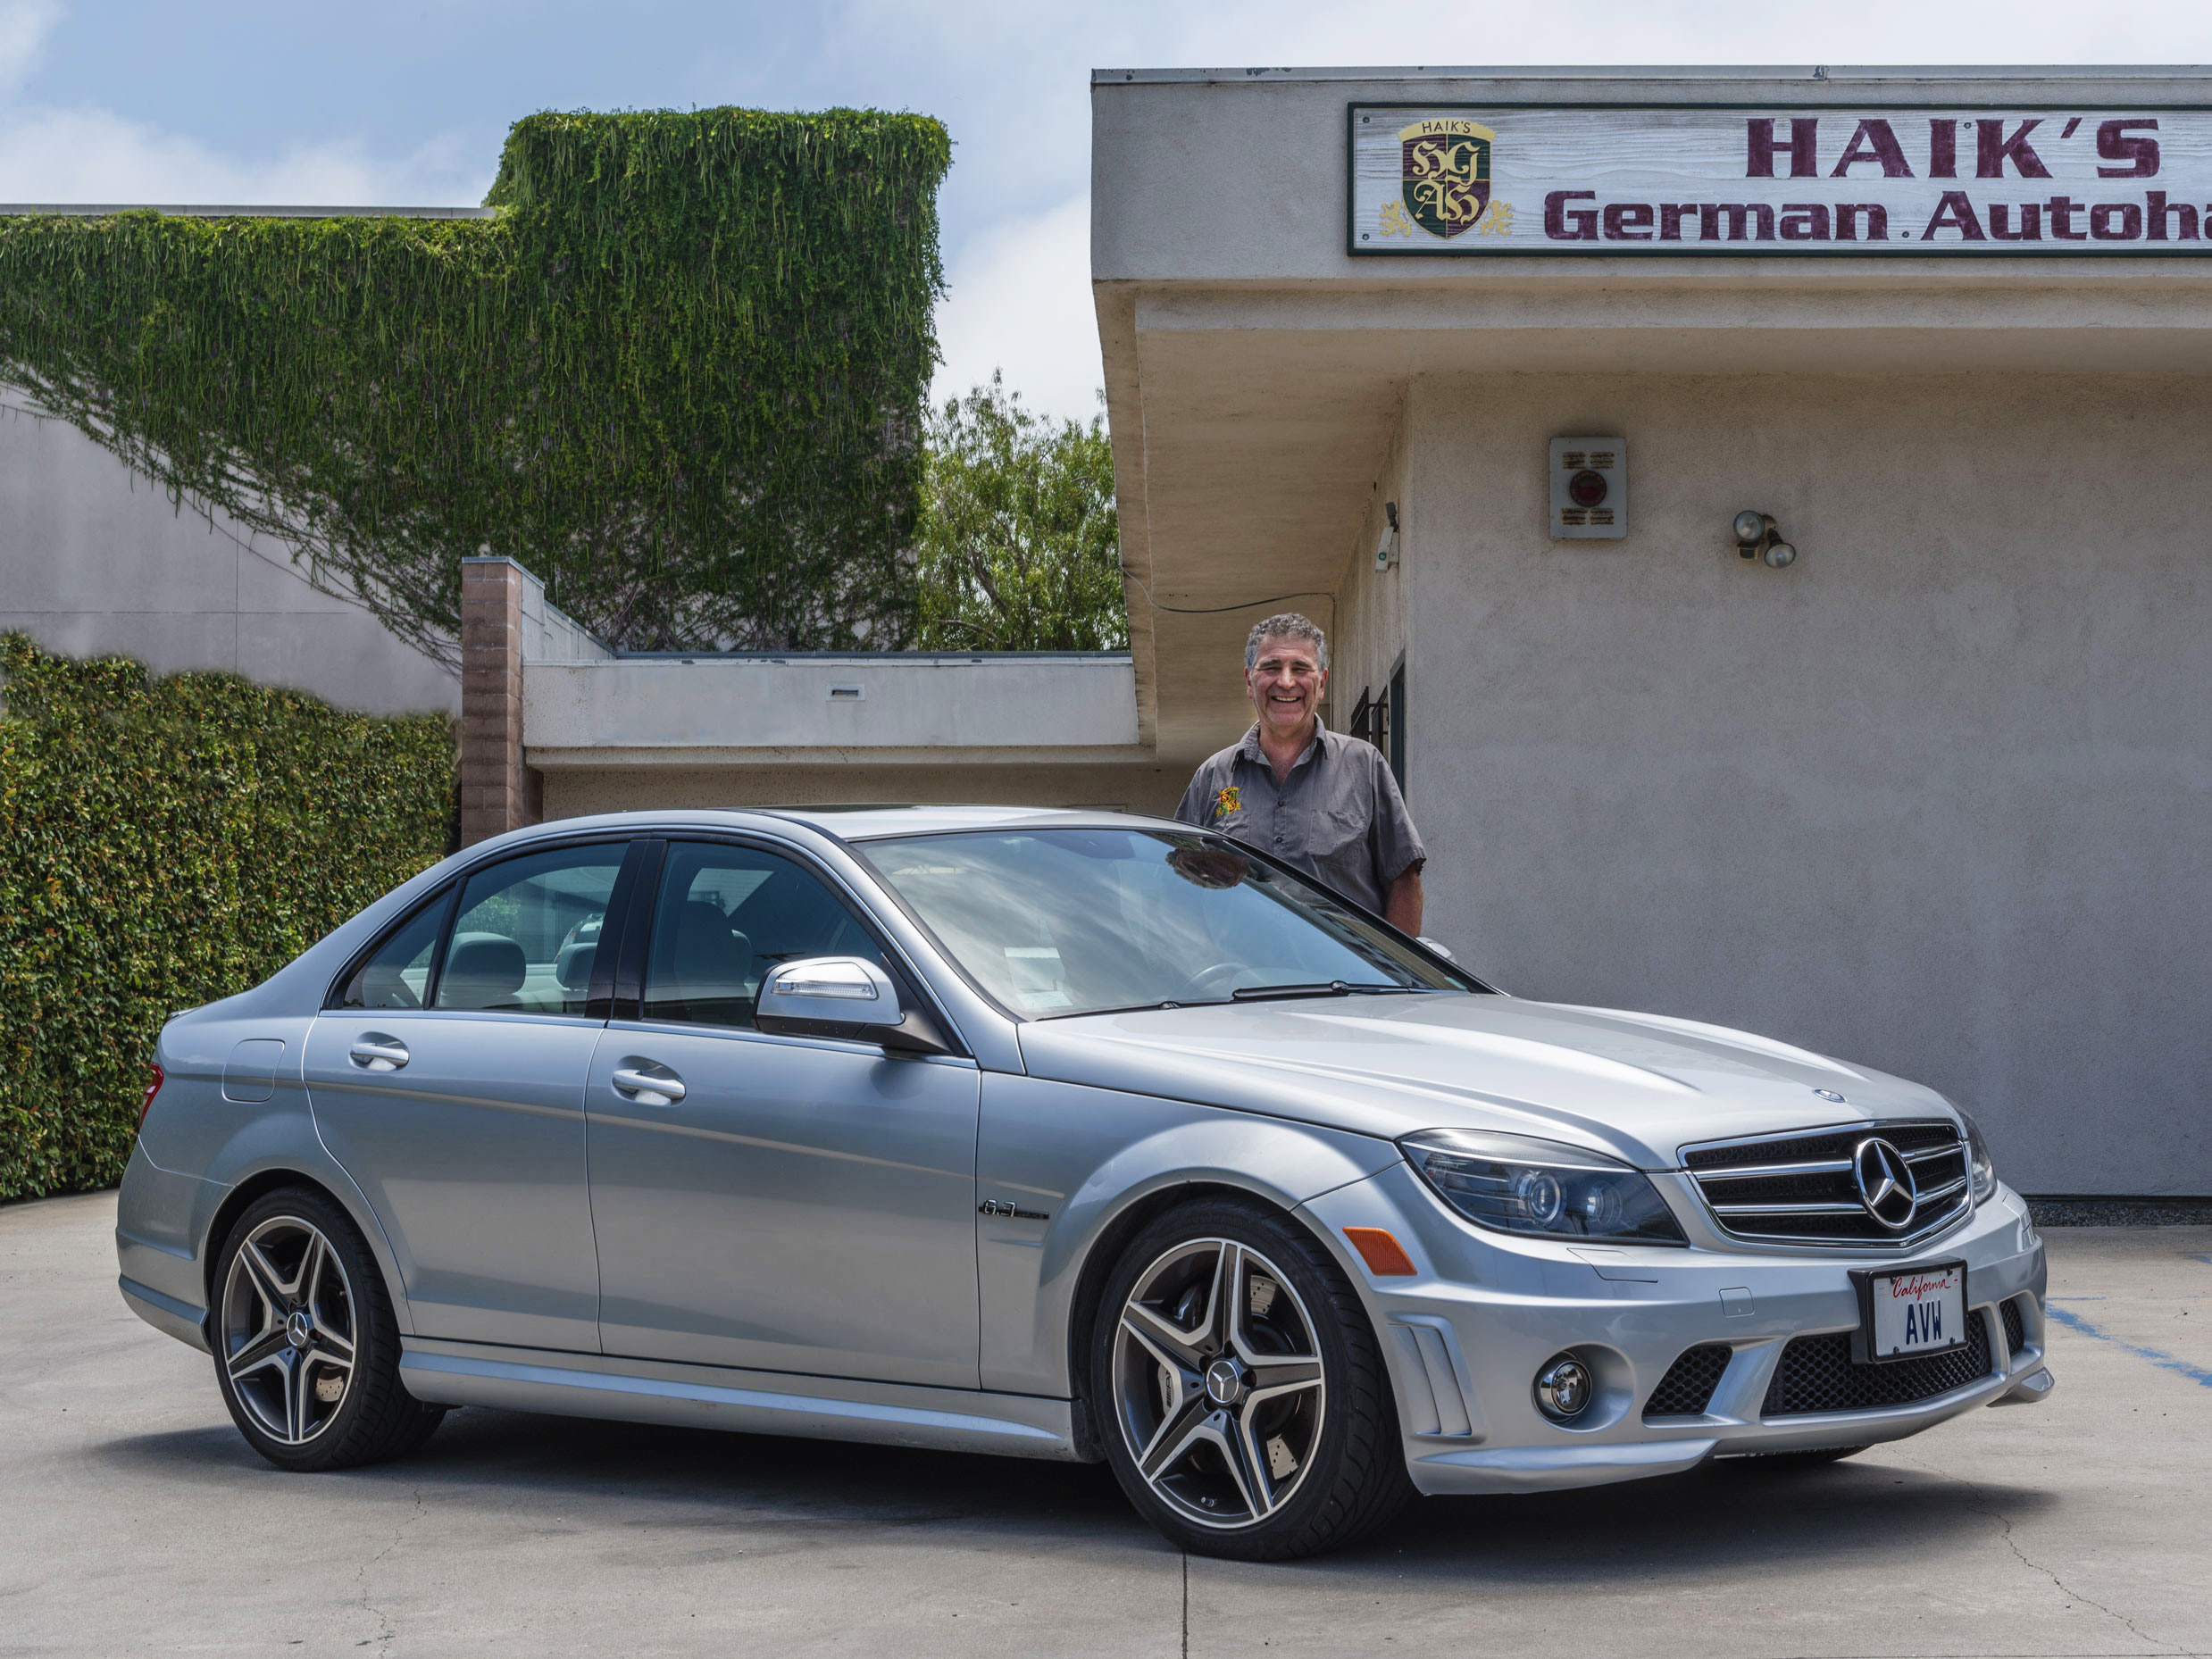 Mercedes repair service santa barbara haik s german autohaus for Santa barbara mercedes benz